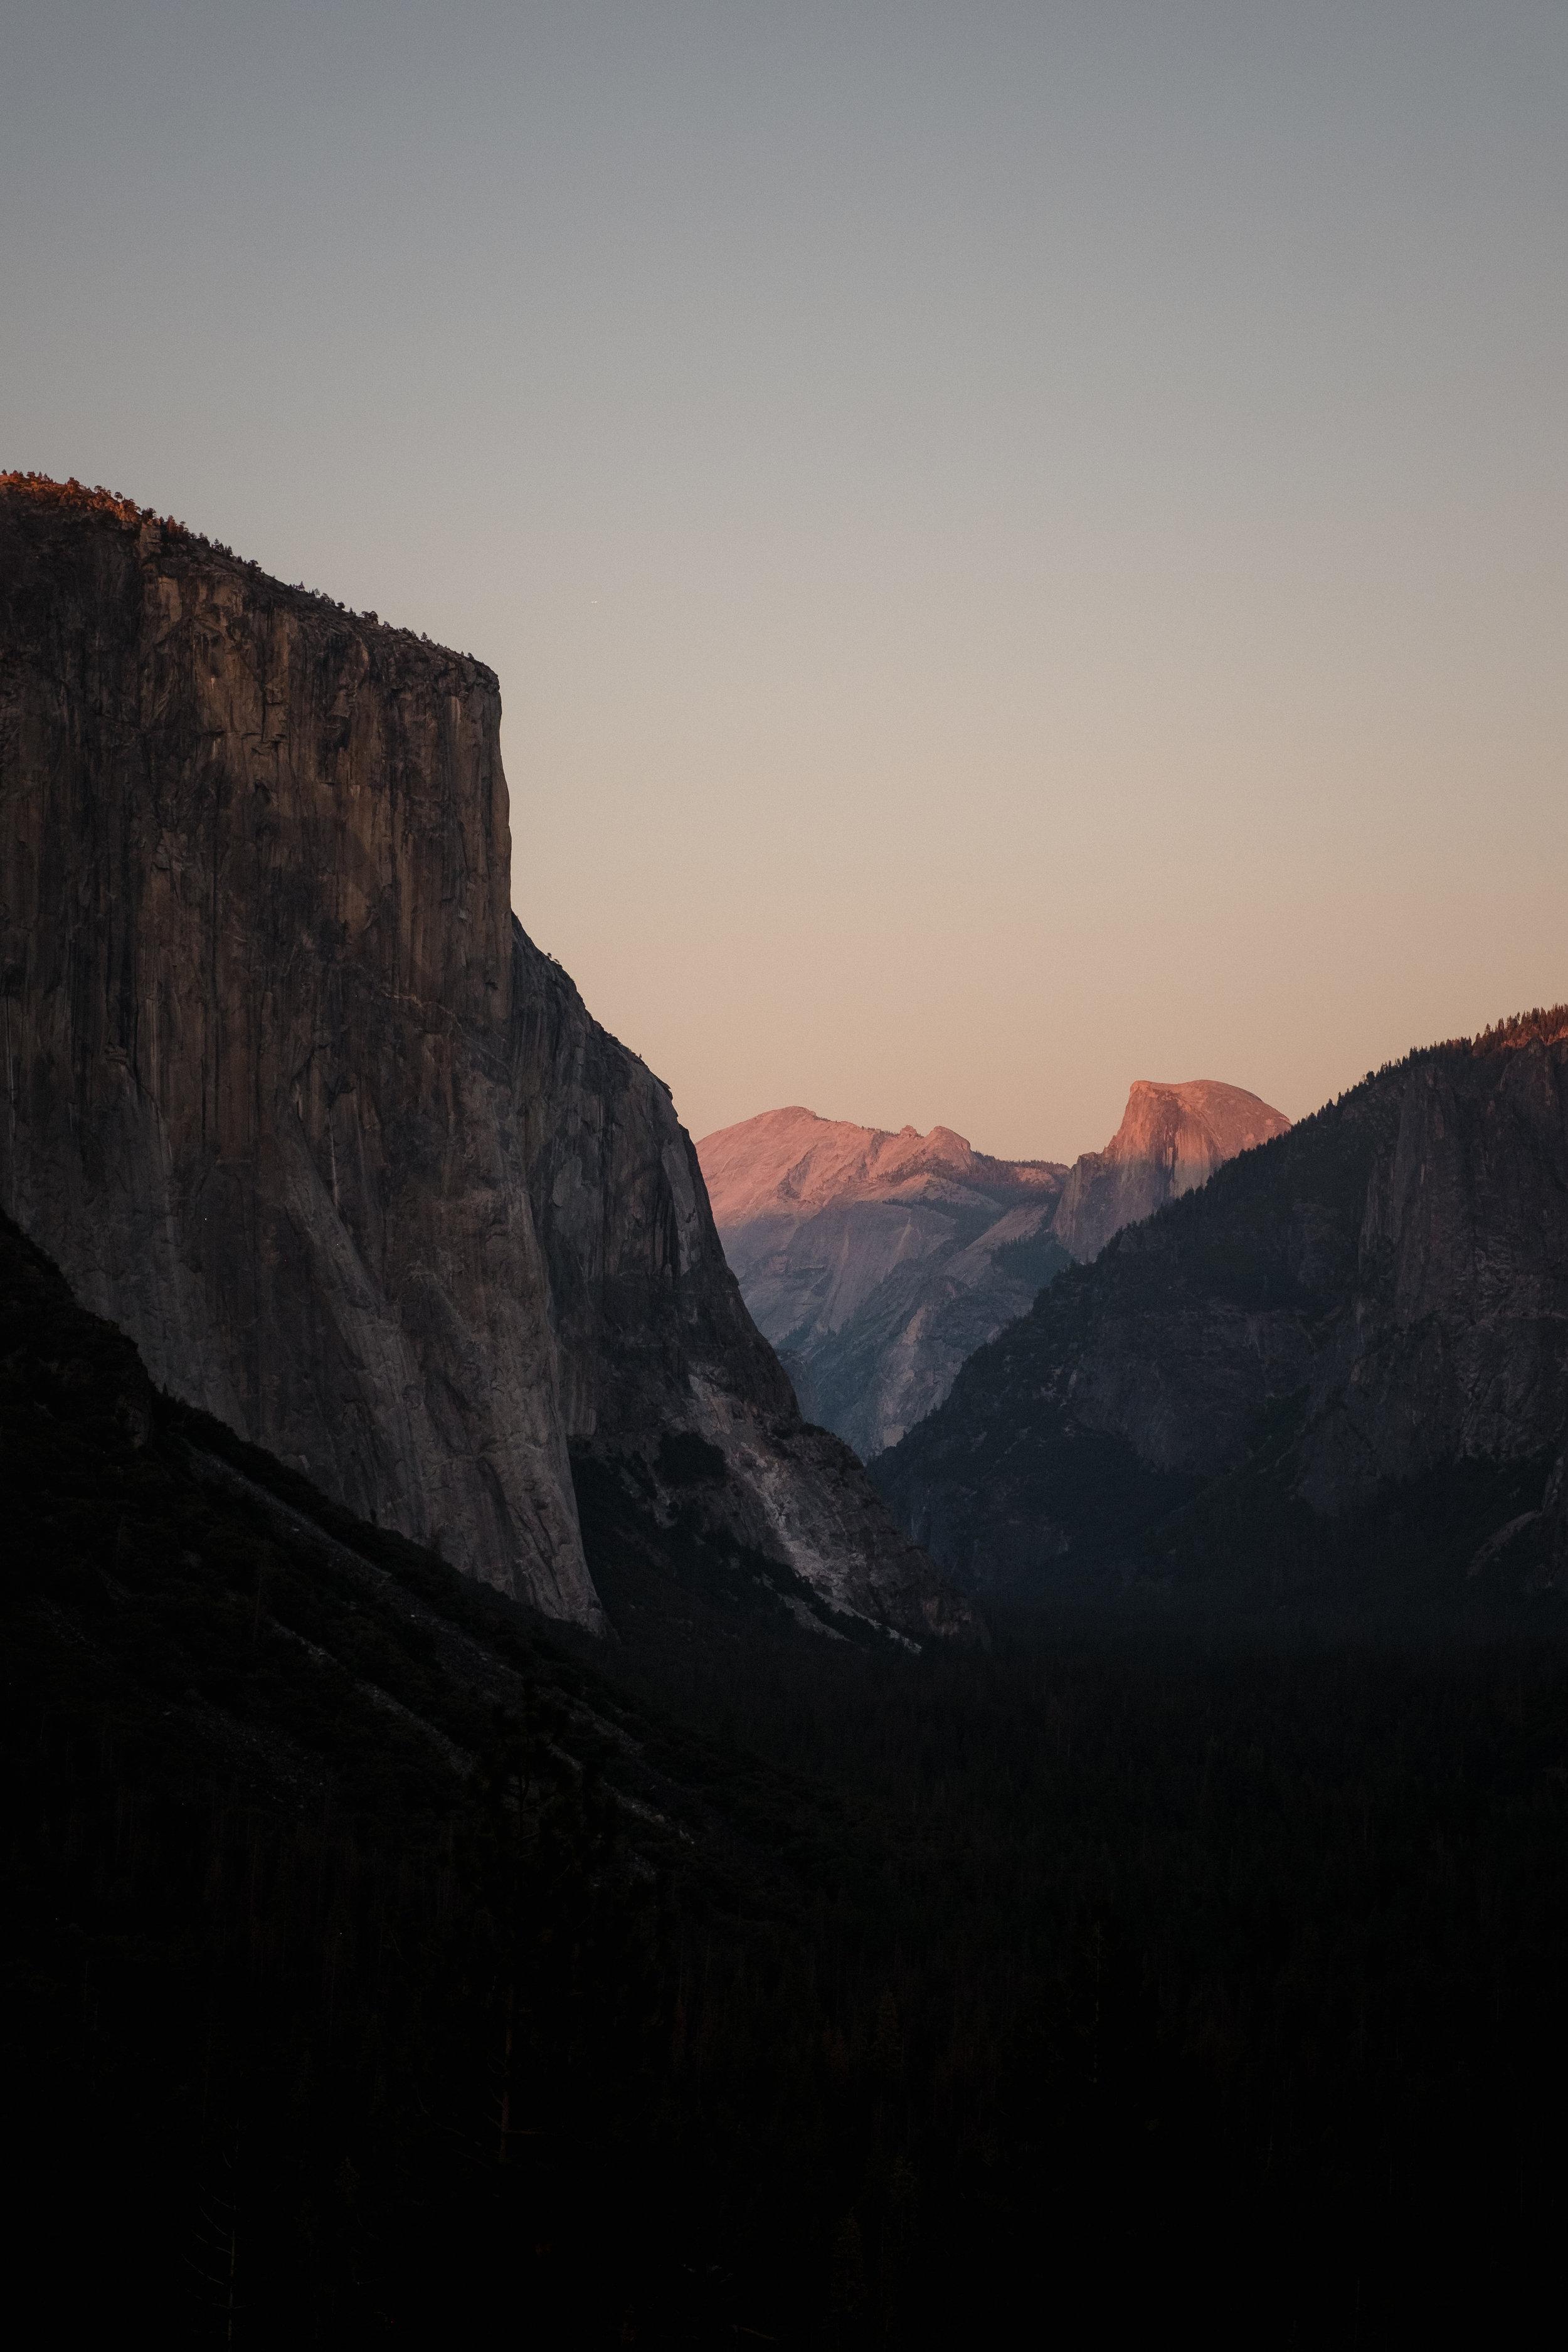 Yosemite_National_Park8.jpg